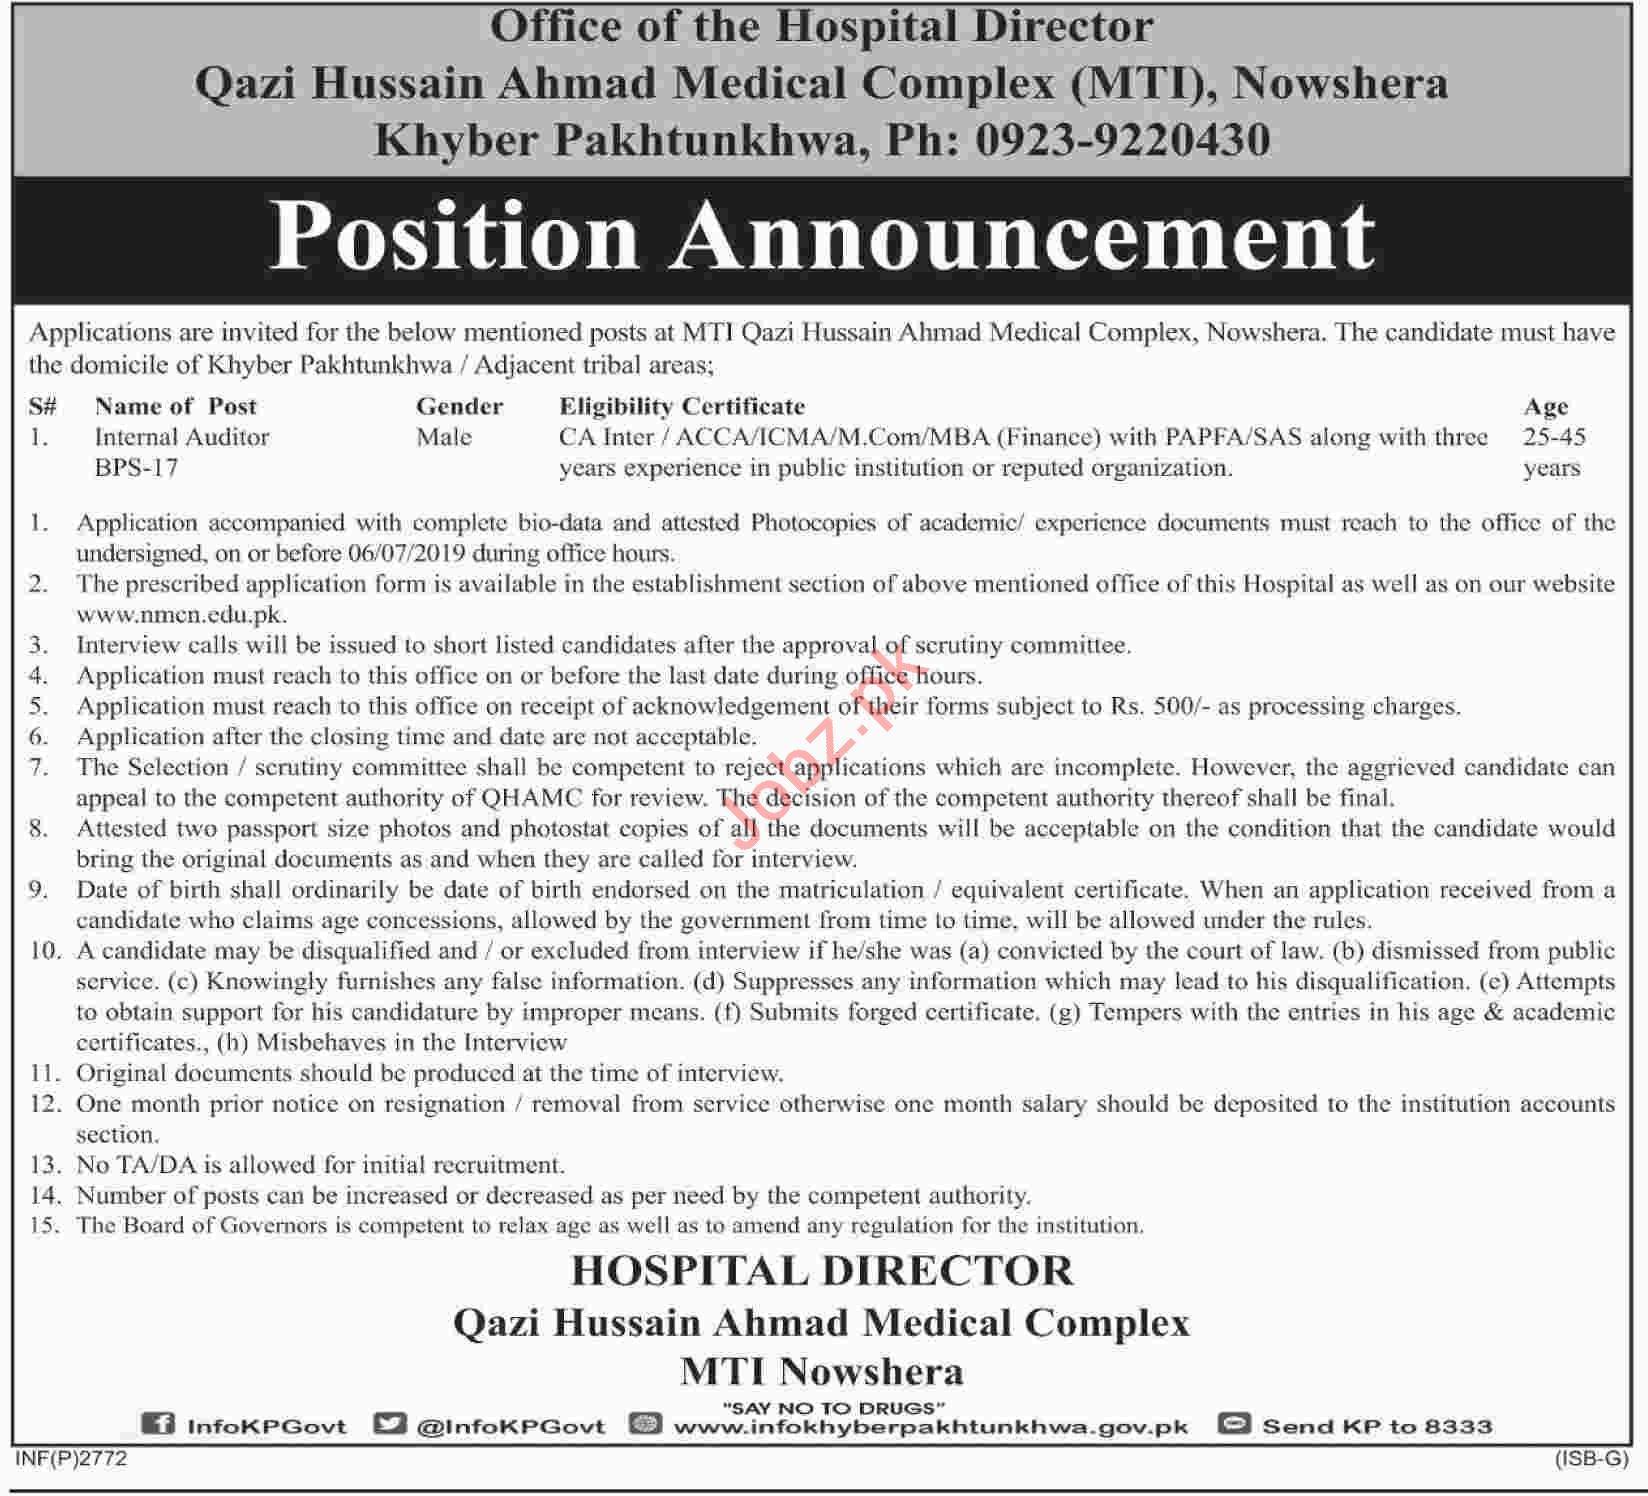 Qazi Hussain Ahmed Medical Complex MTI Auditor Jobs 2019